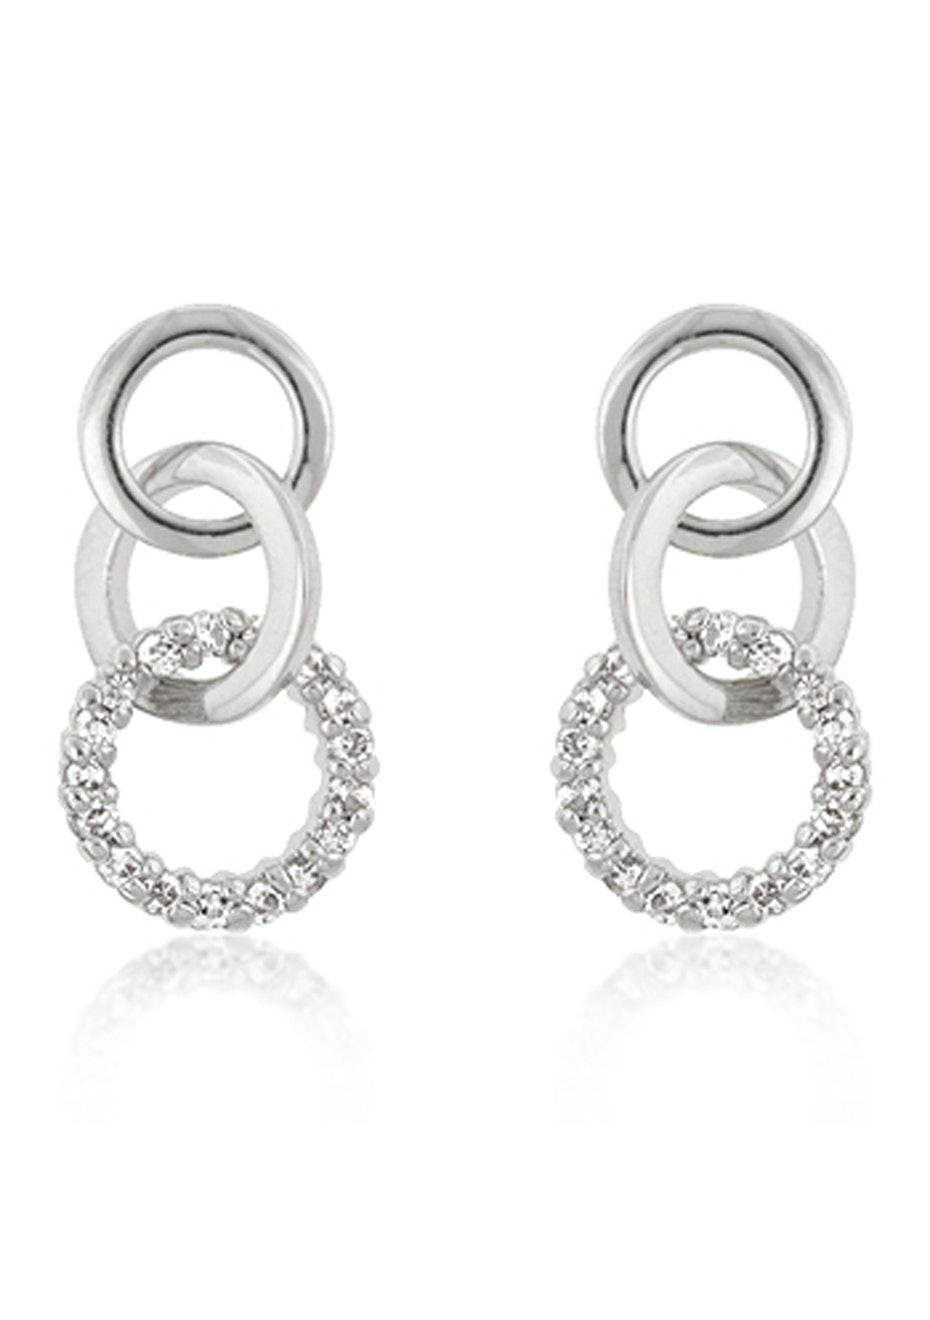 White gold bonded Triple Hoop Earrings